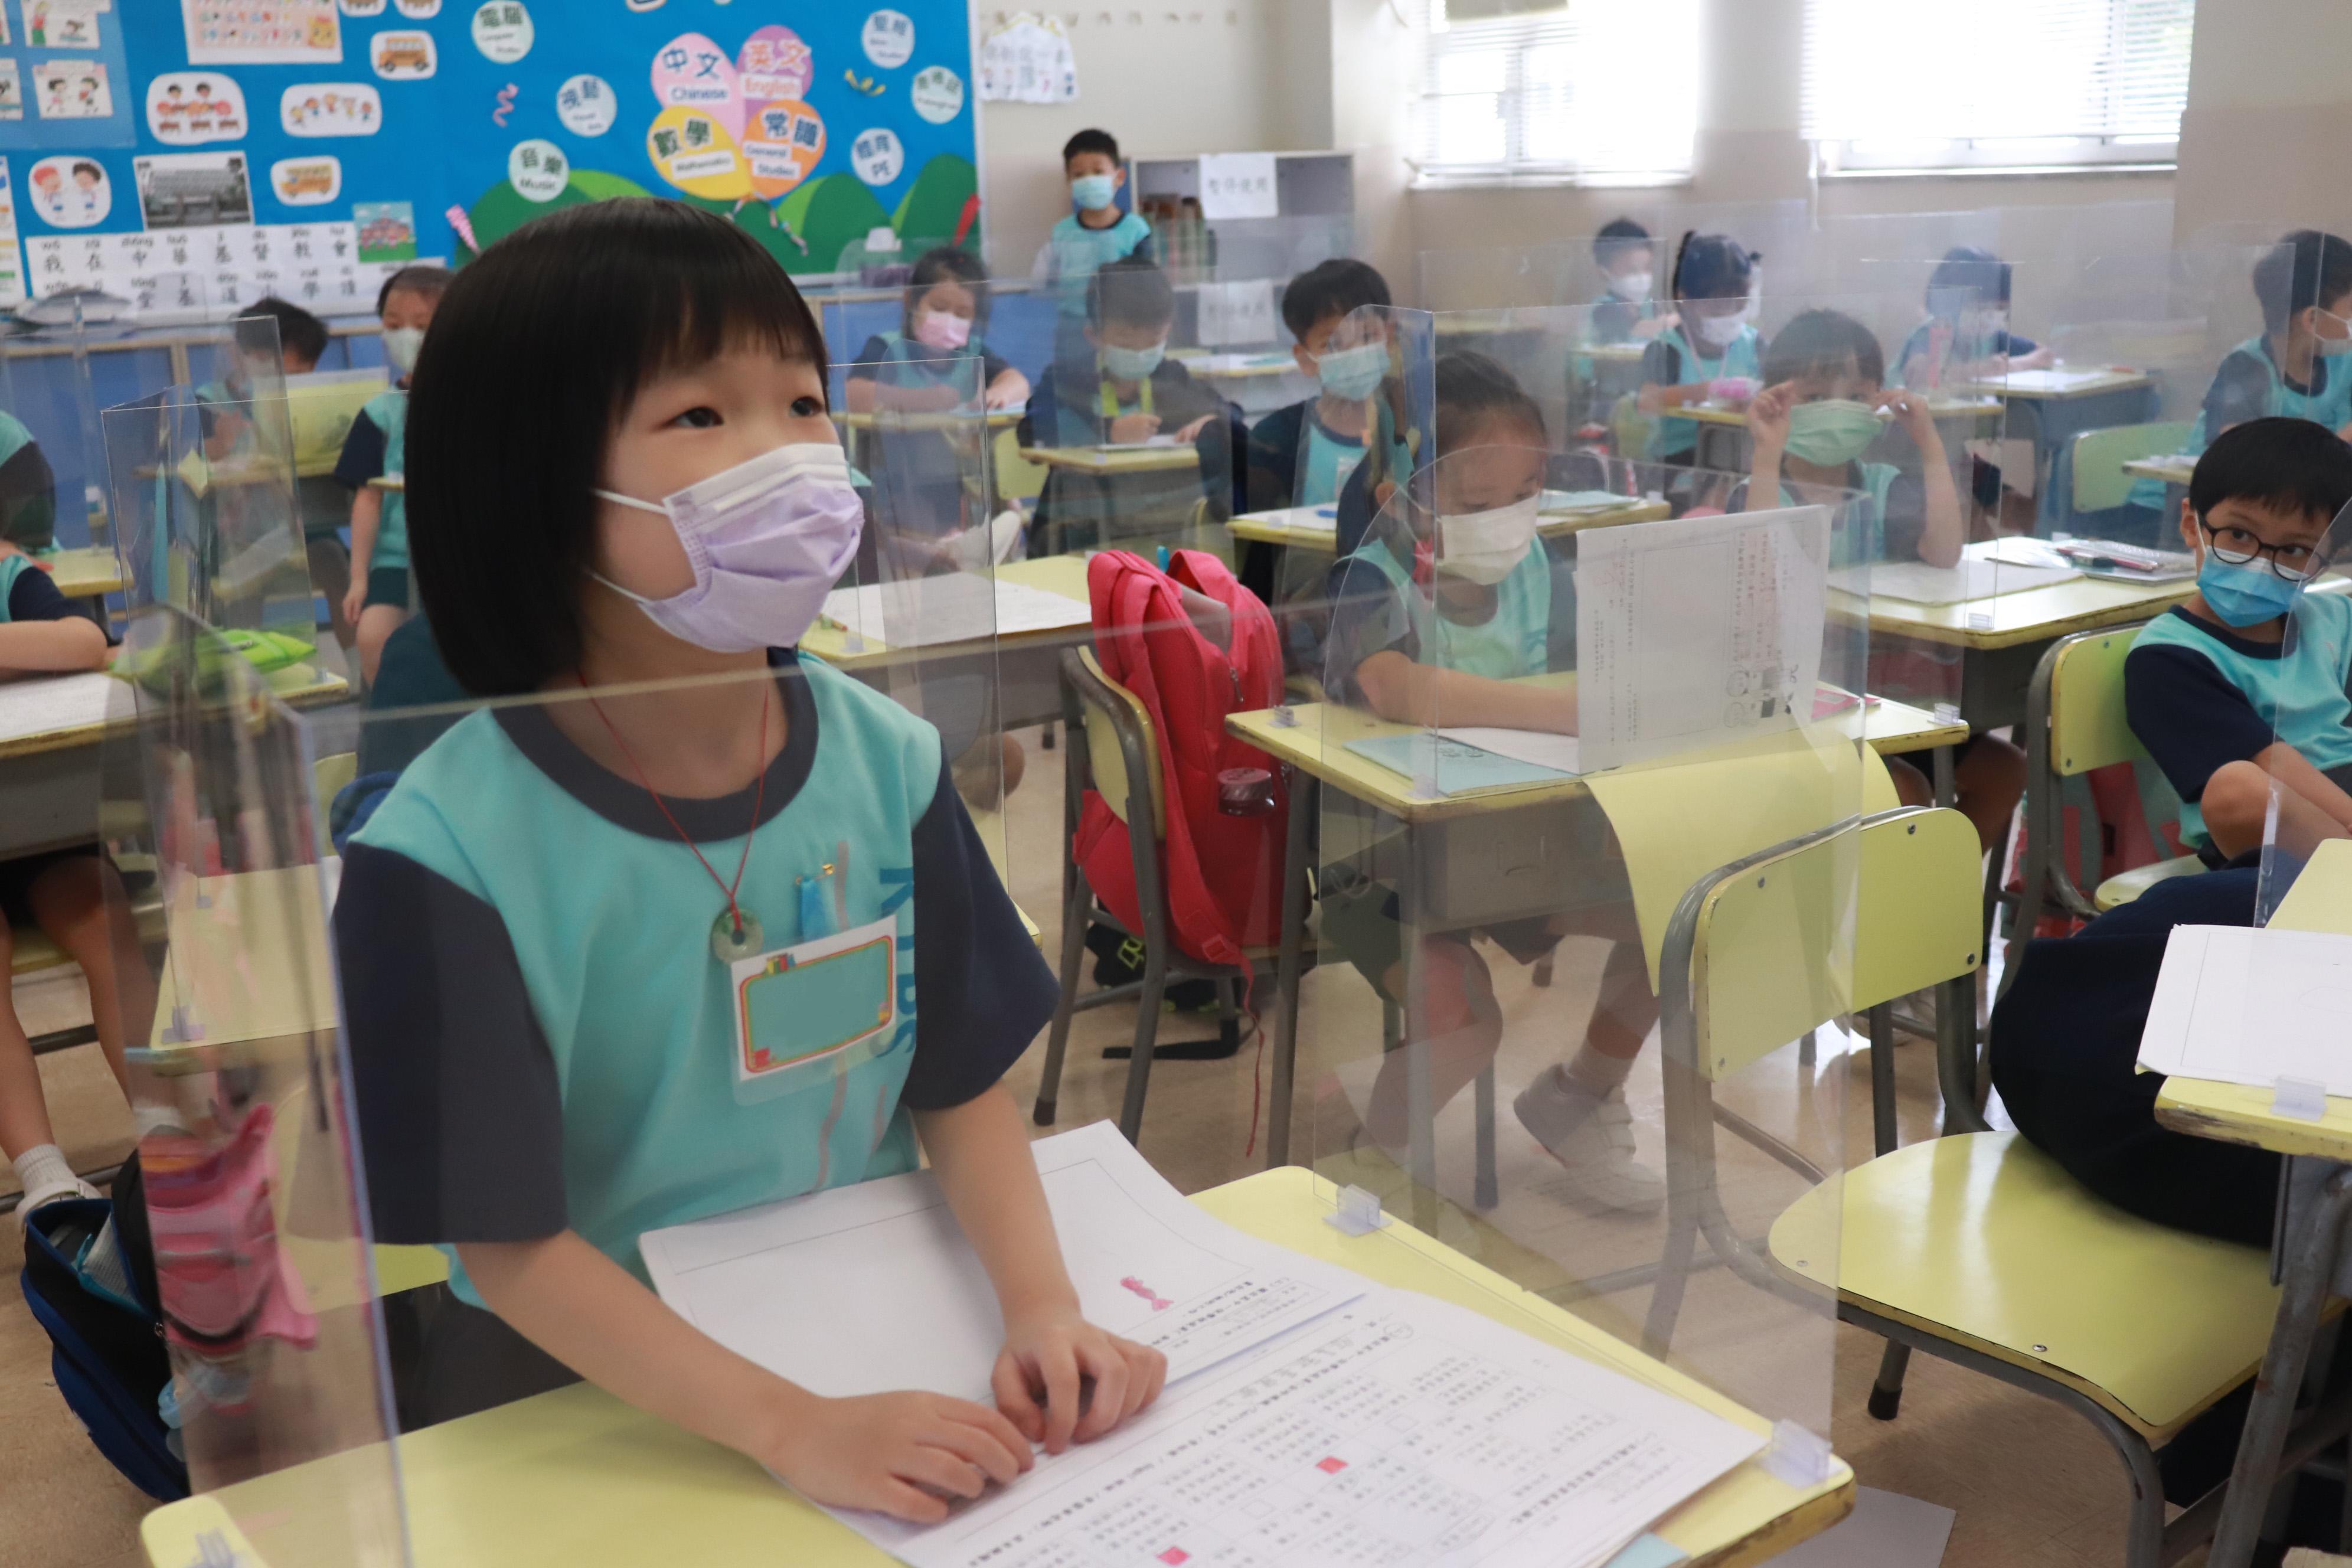 http://keito.school.hk/sites/default/files/img_6690.jpg